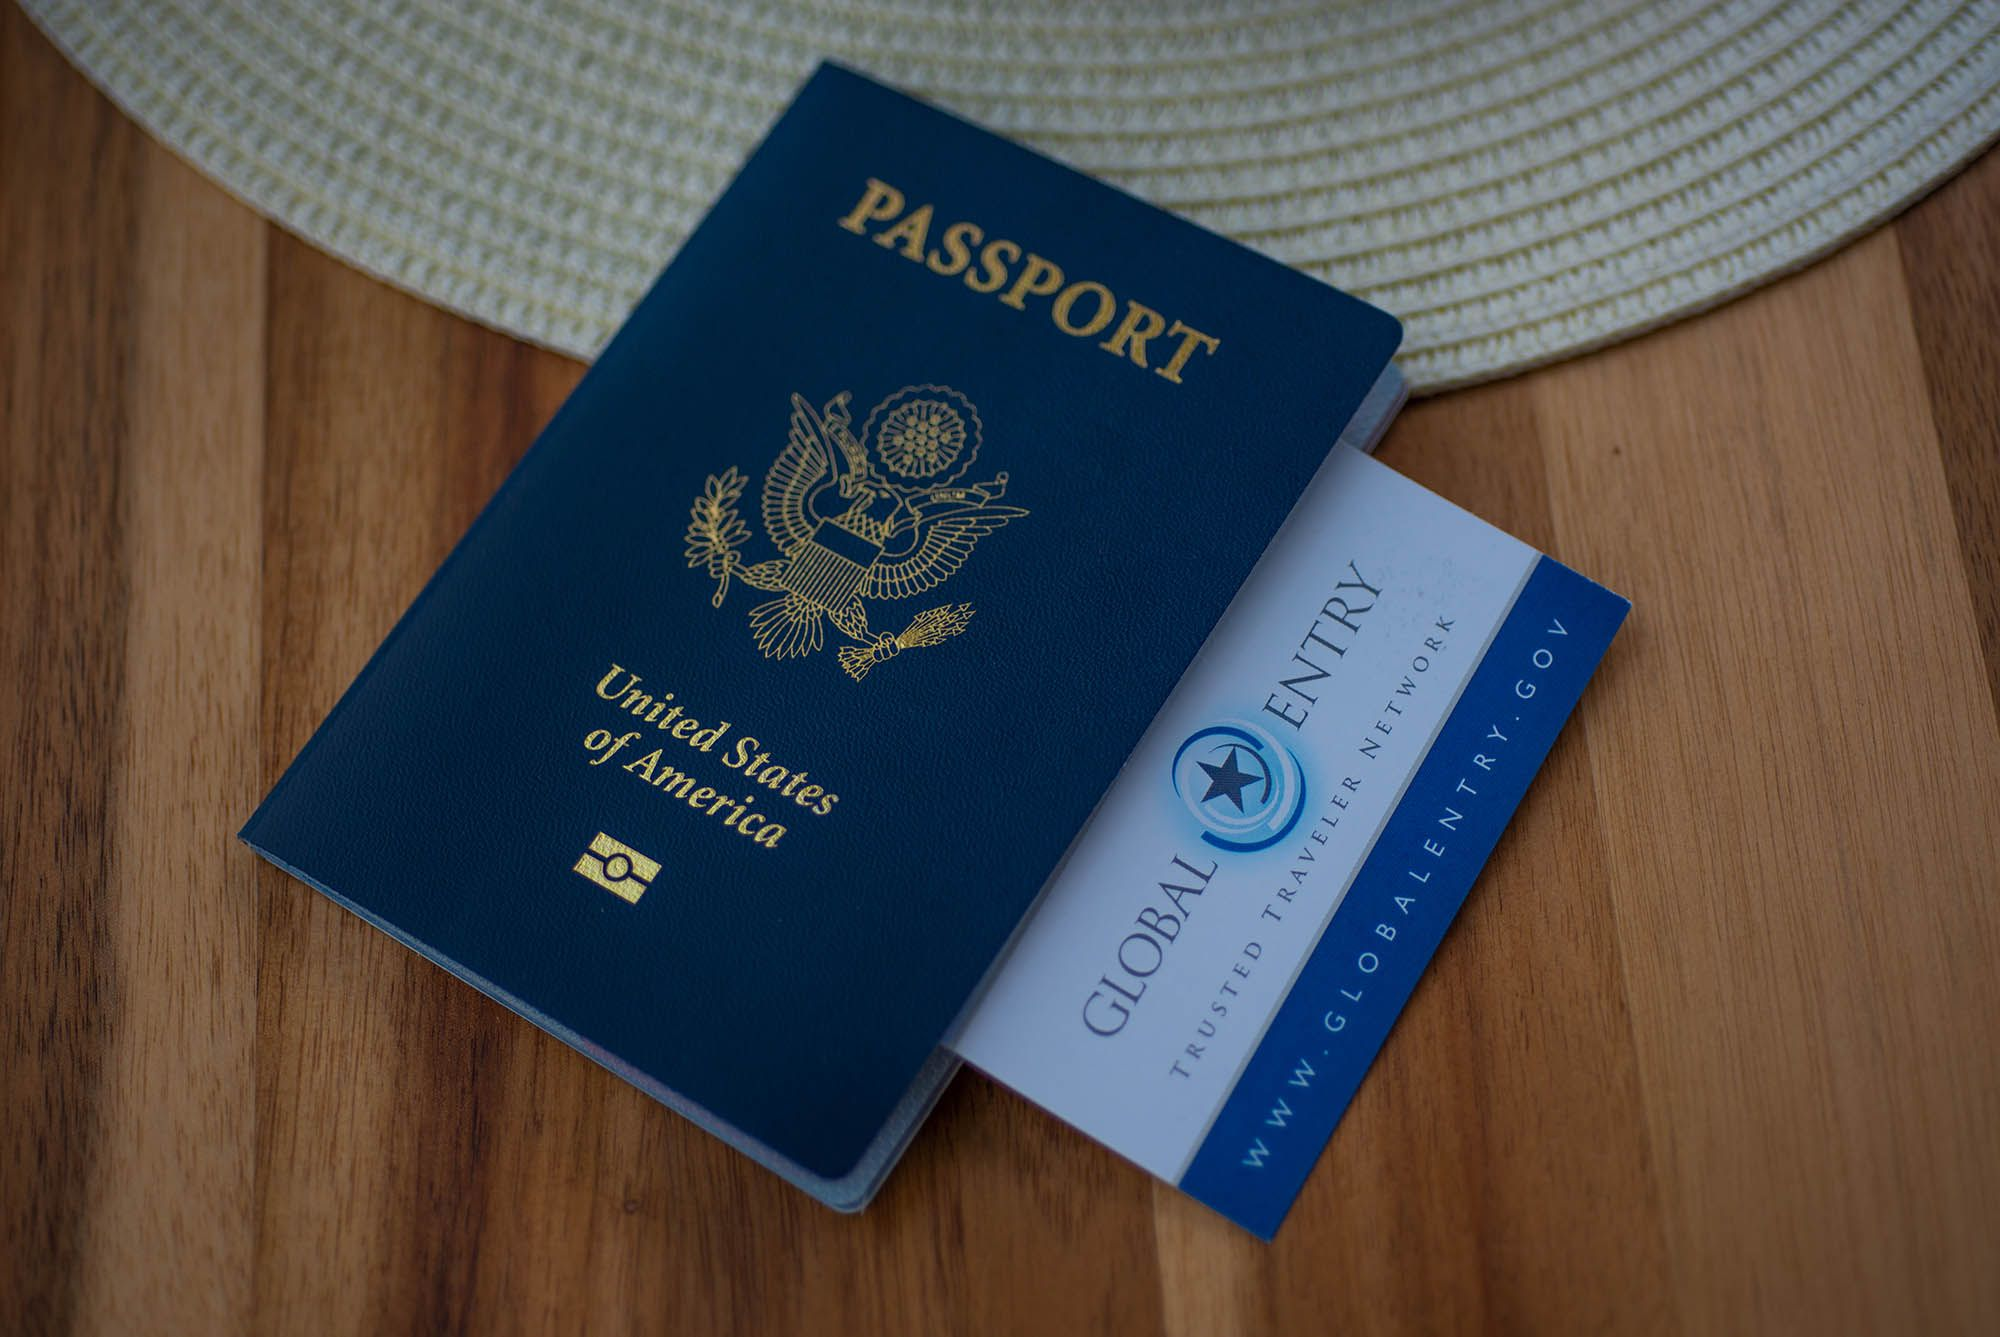 19d17274c9cd100cdd4ce380c180e506 - Global Entry Application New York City